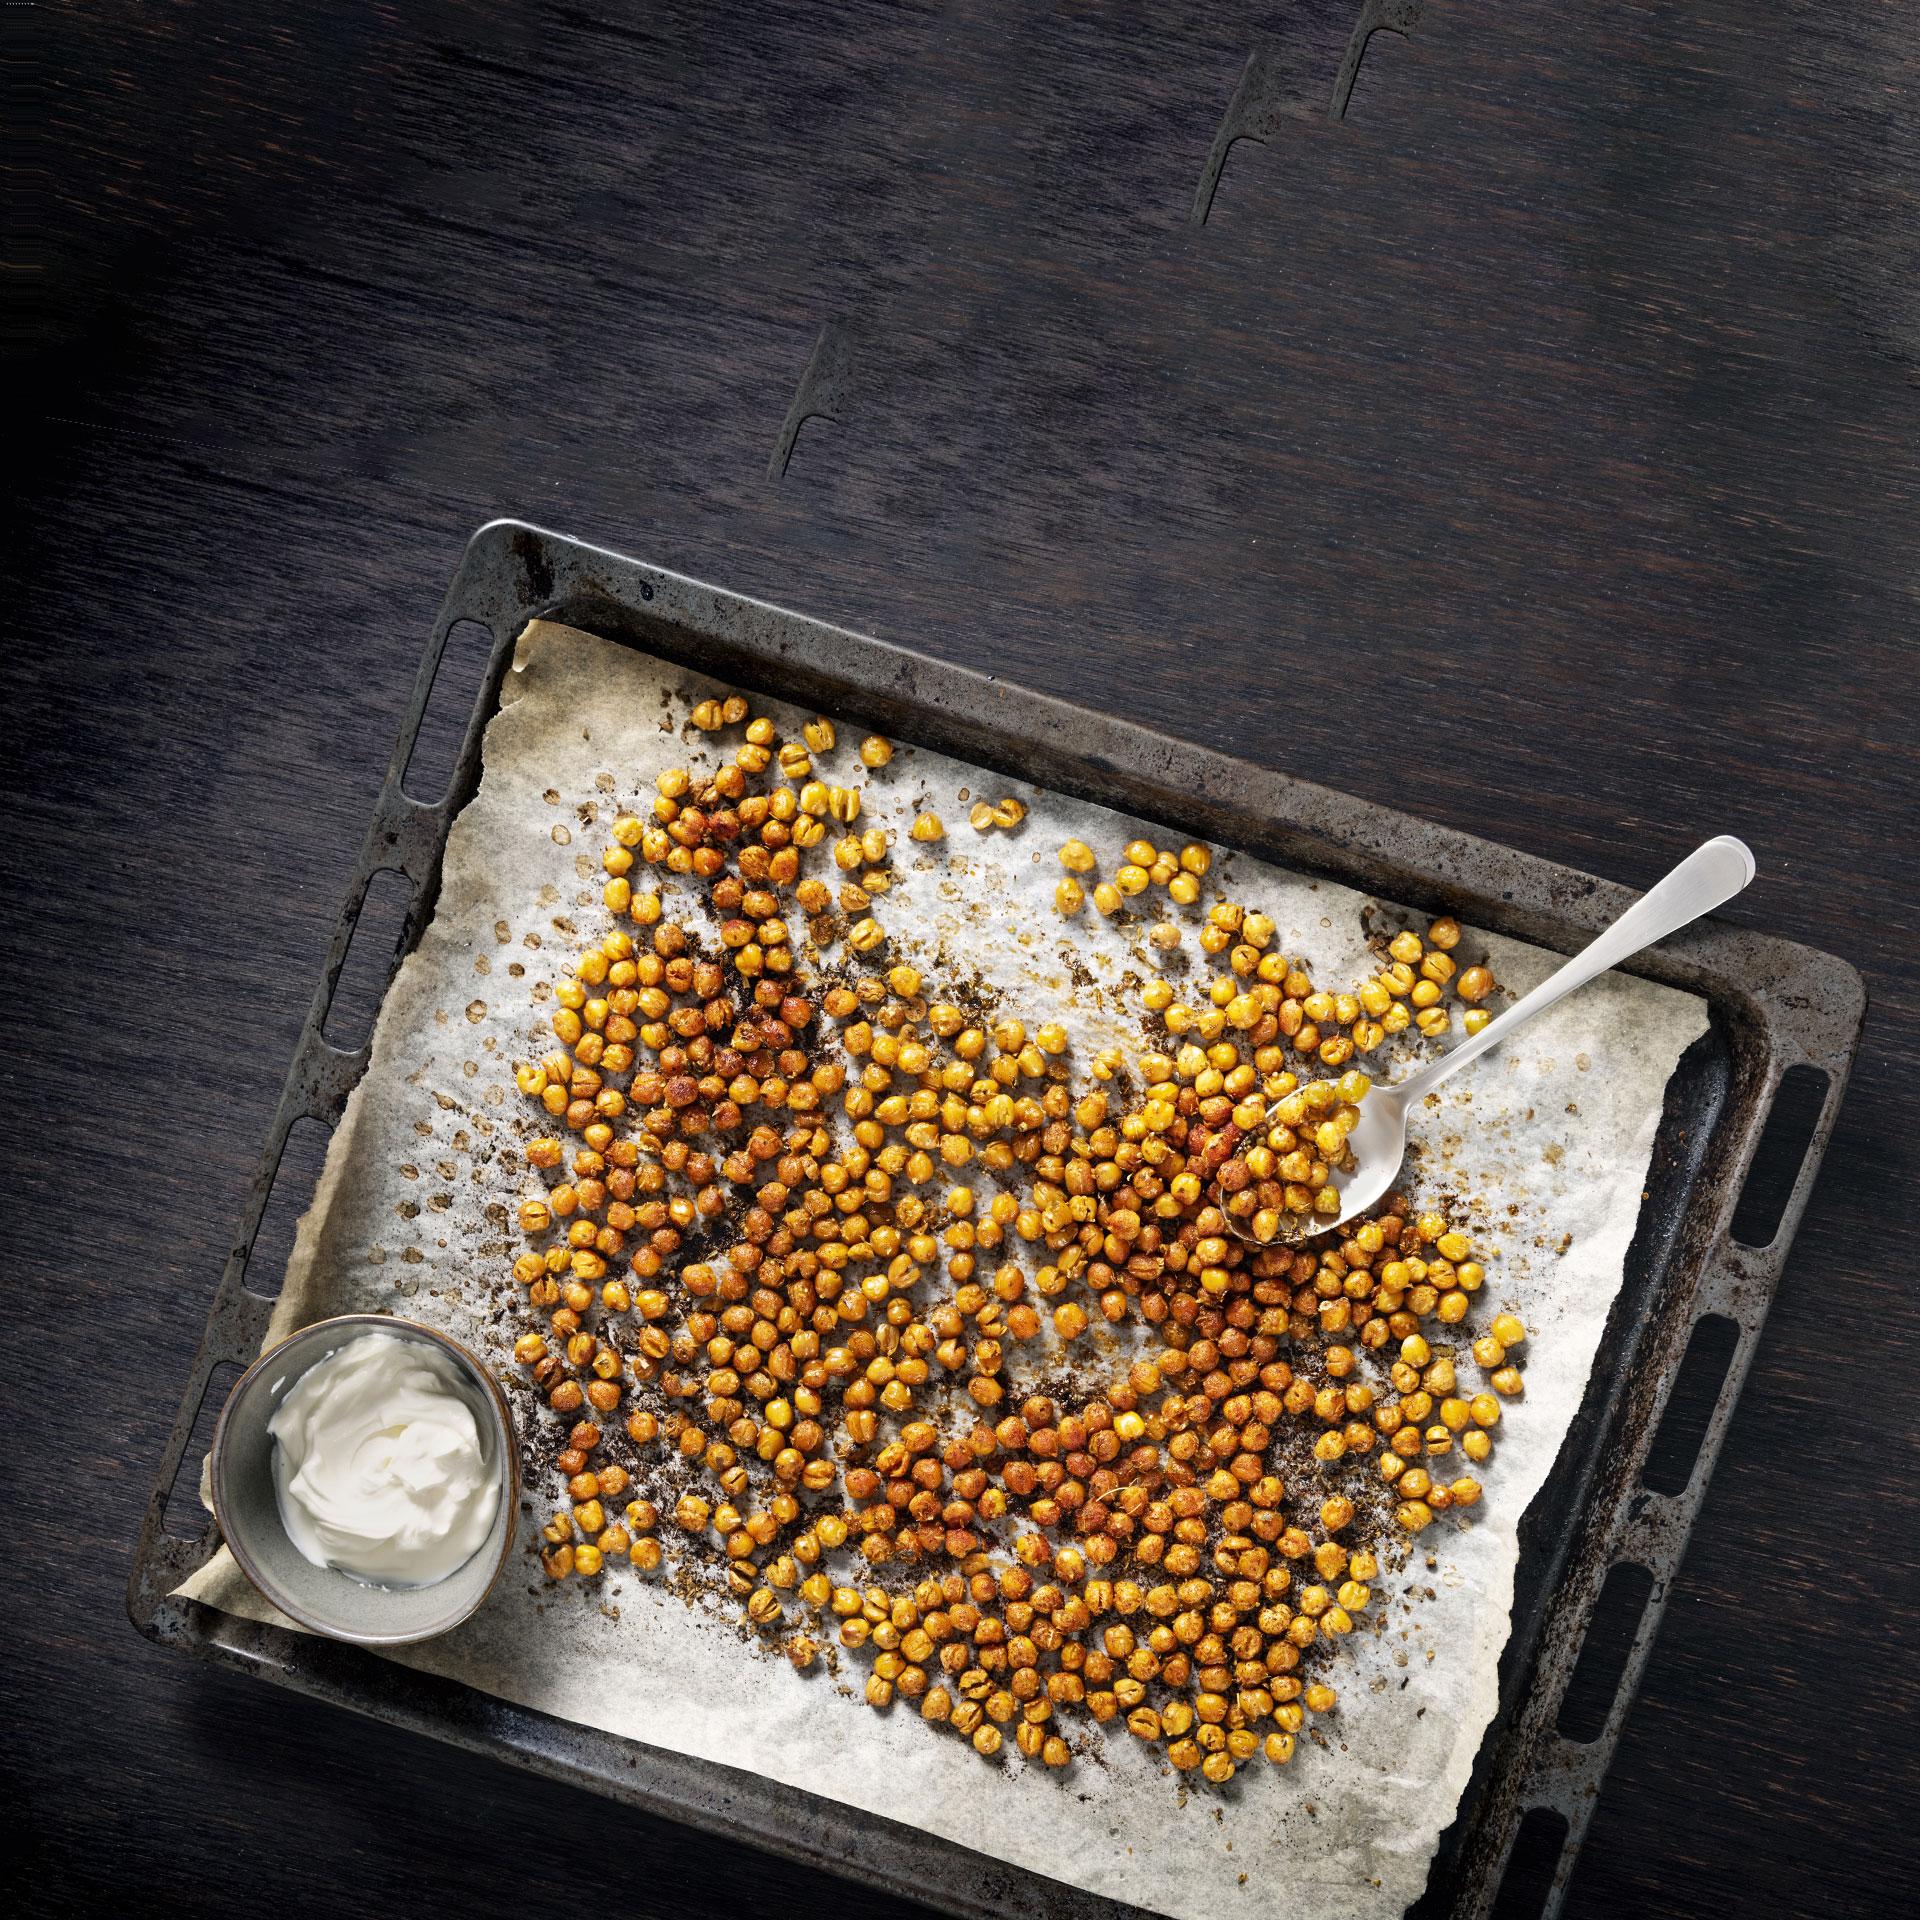 Chickpeas on a roasting pan